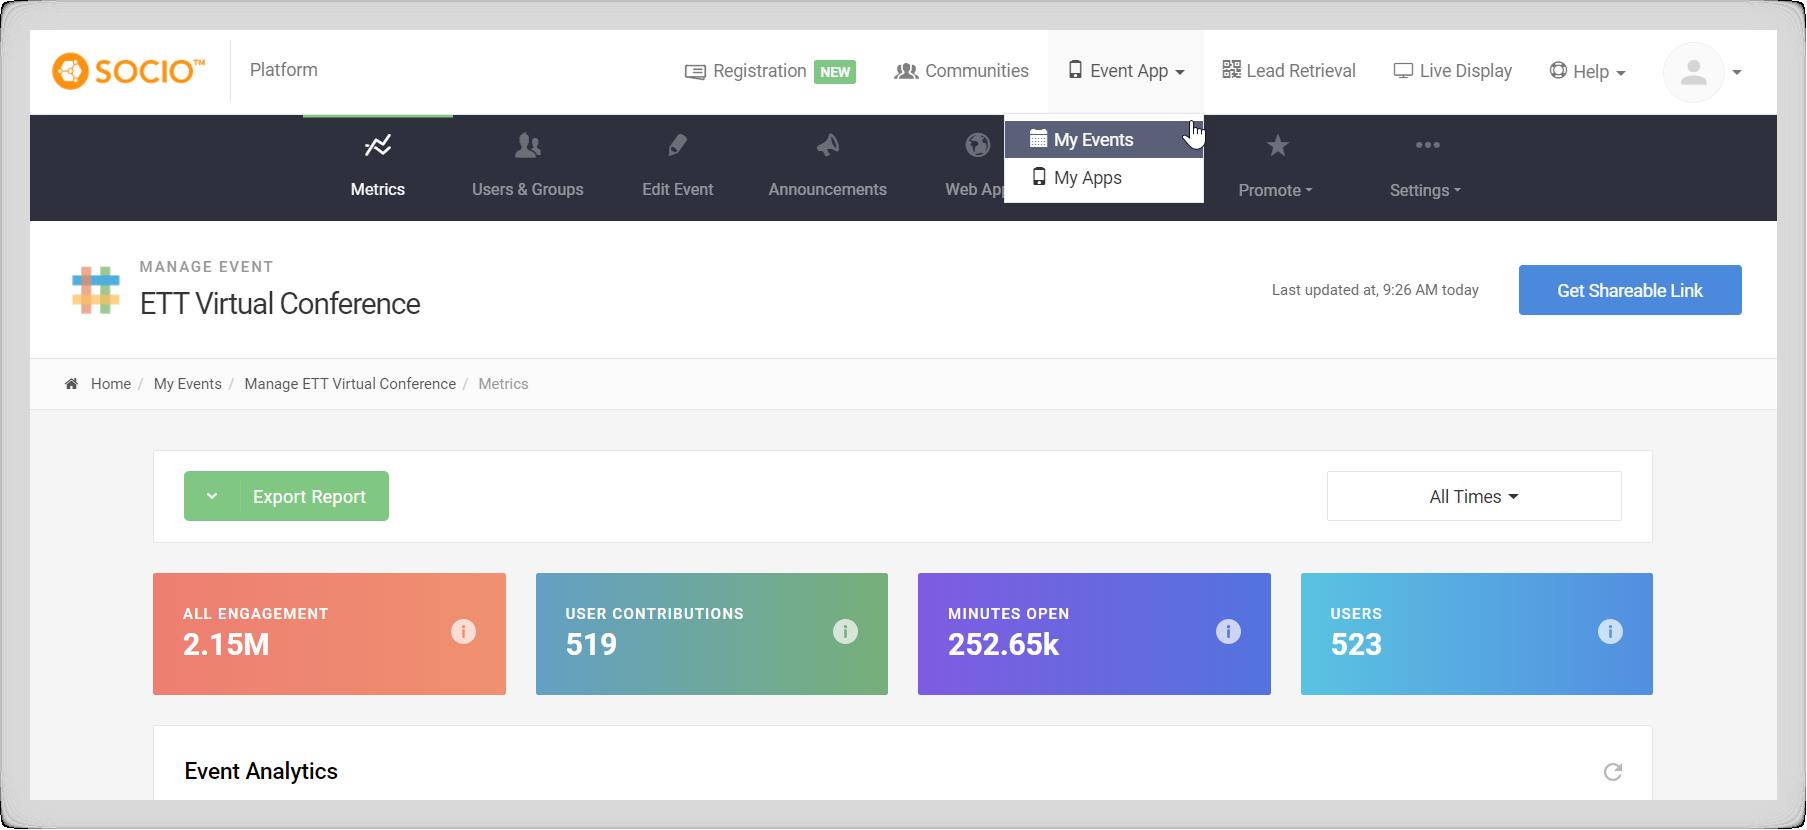 Screenshot of an event in the Socio Platform.